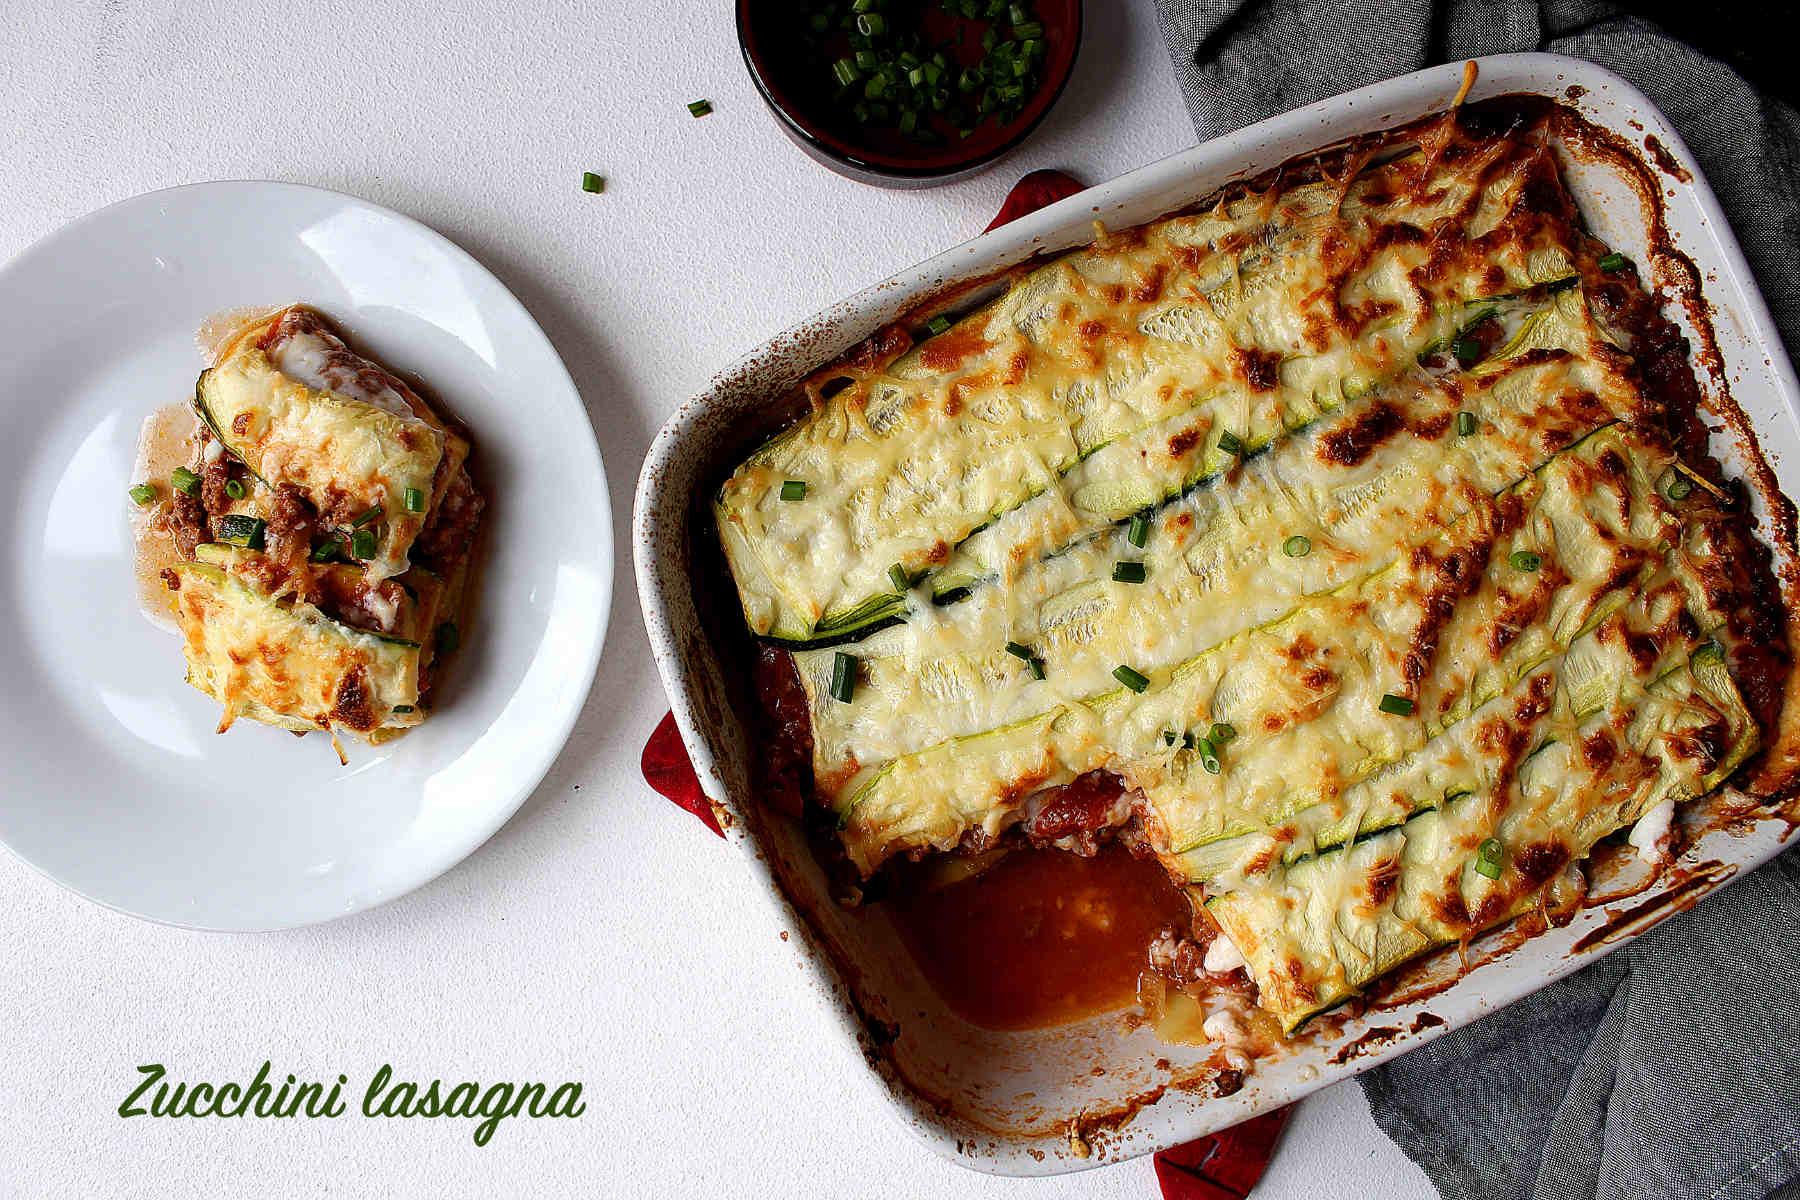 Zucchini lasagna (low carb)